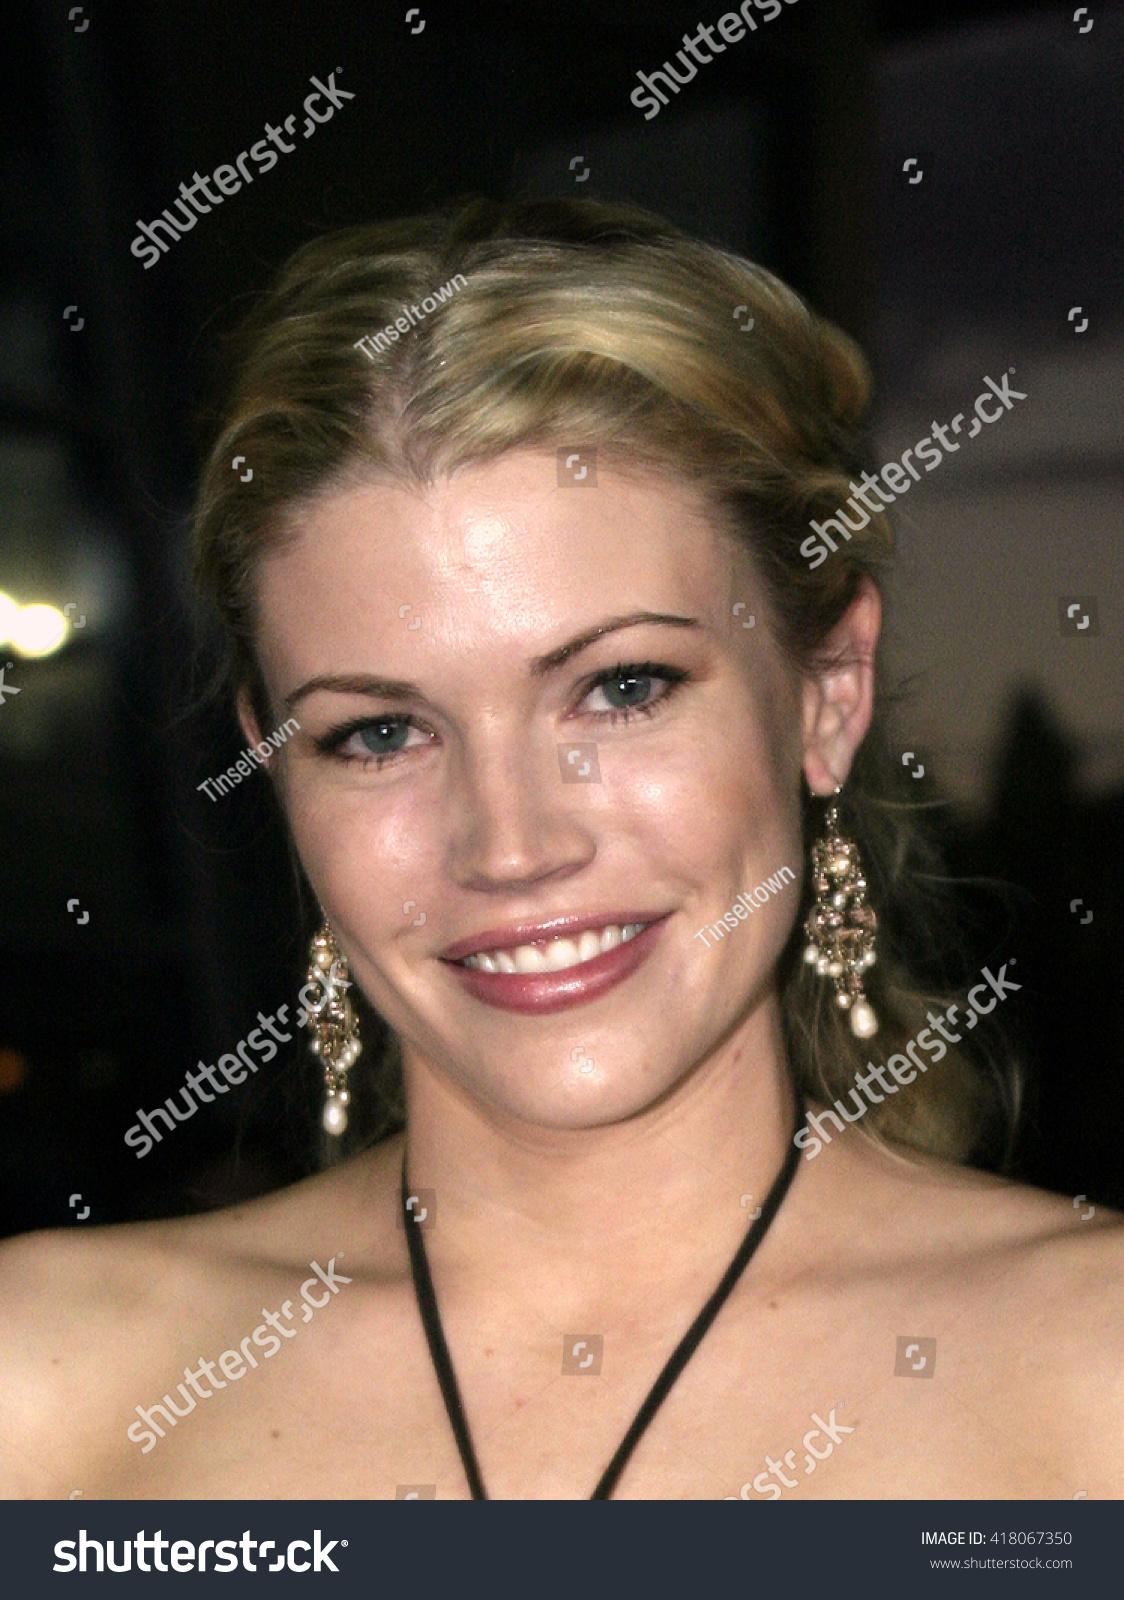 Neha Mehta 2001,Tim McInnerny (born 1956) XXX image Nicole Grimaudo,Elizabeth Alexander (actress)